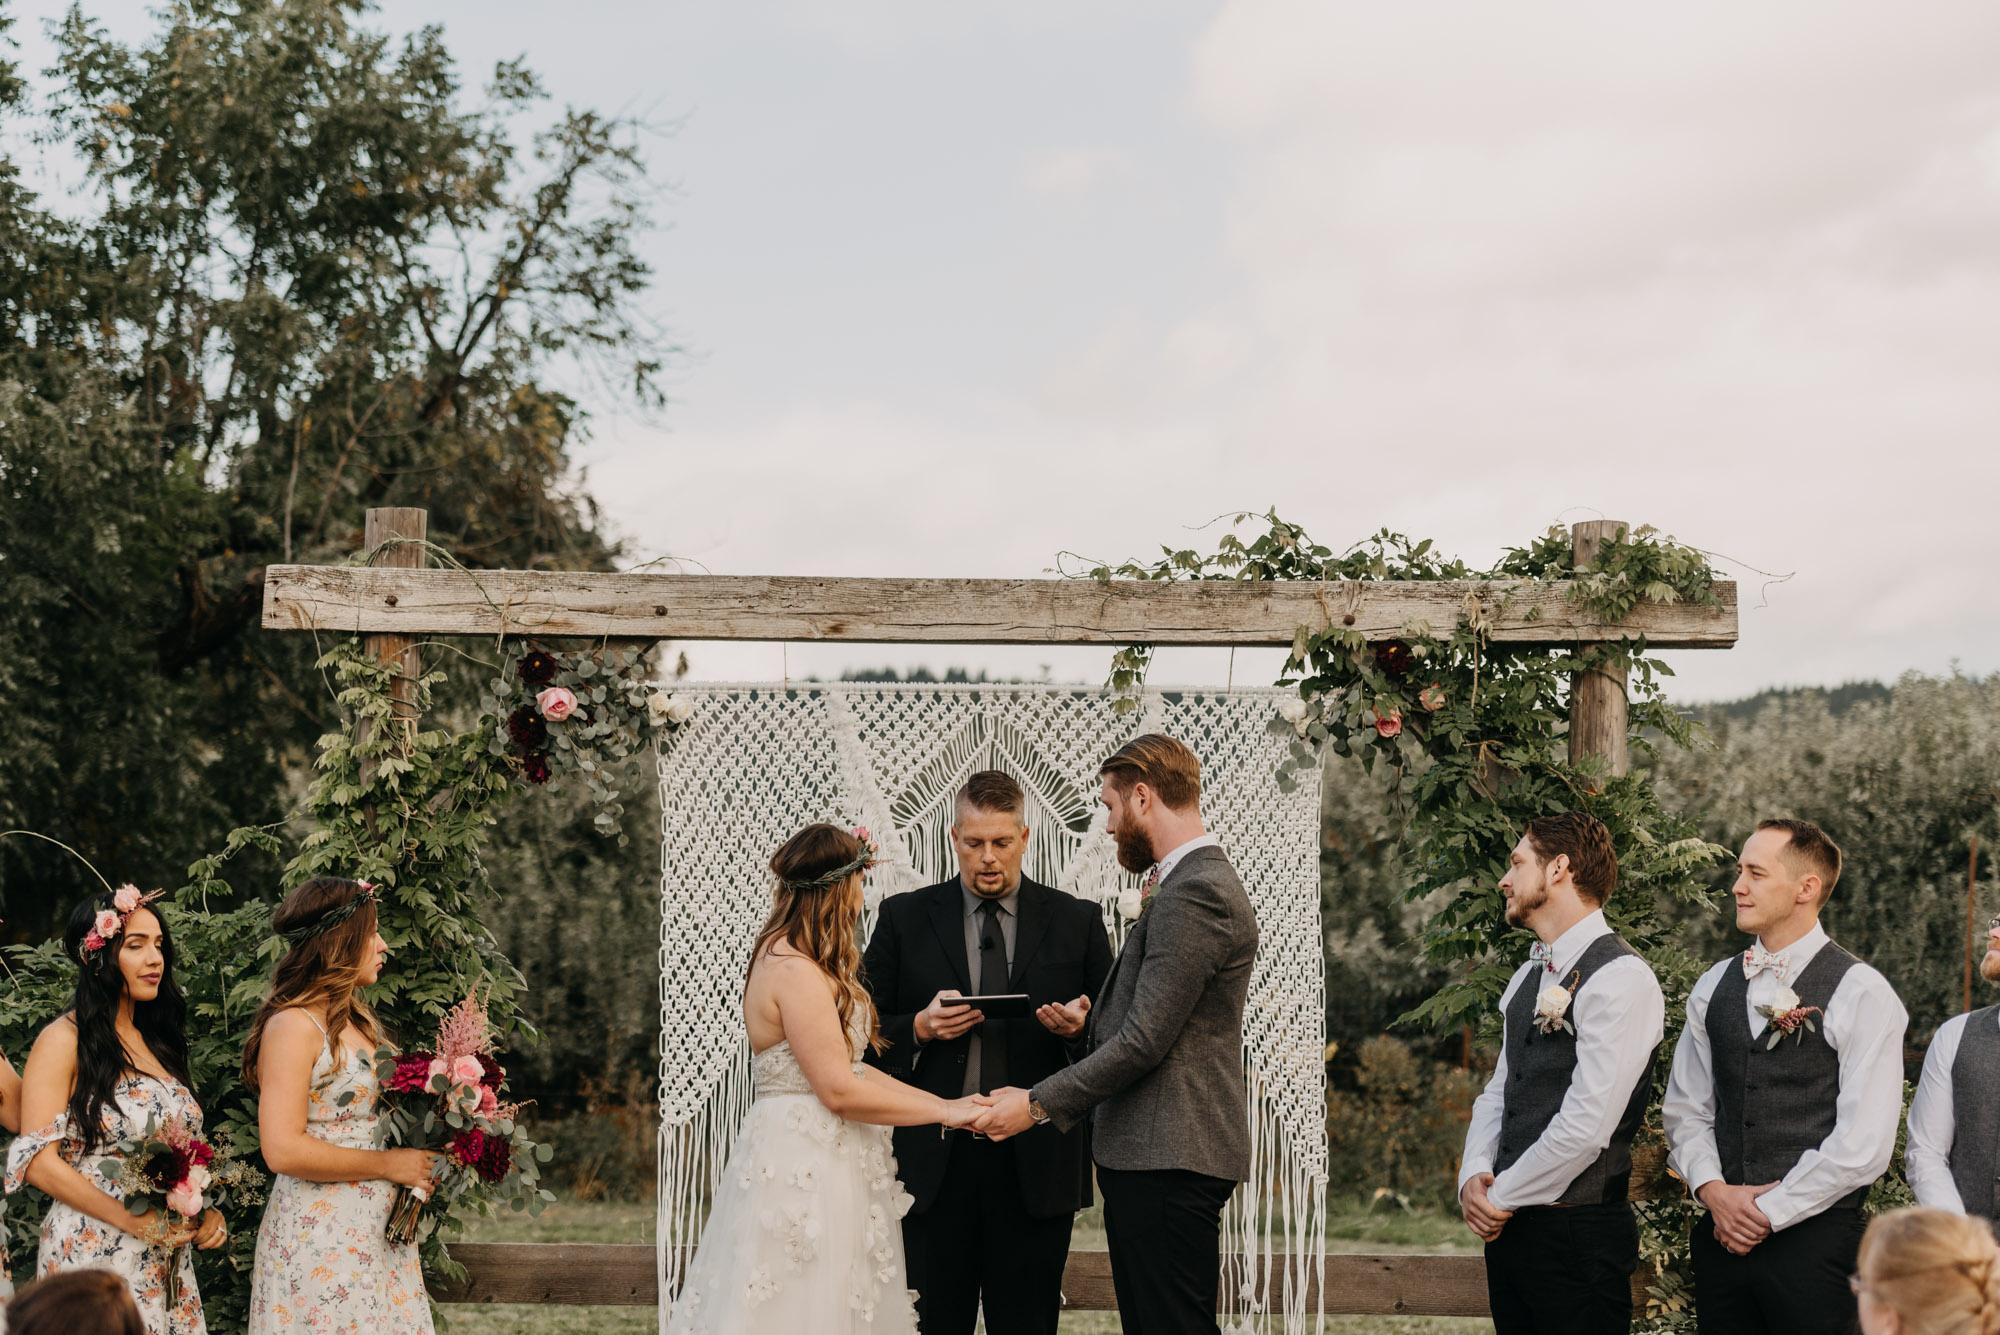 Outdoor-Summer-Ceremony-Washington-Wedding-Rainbow-9107.jpg